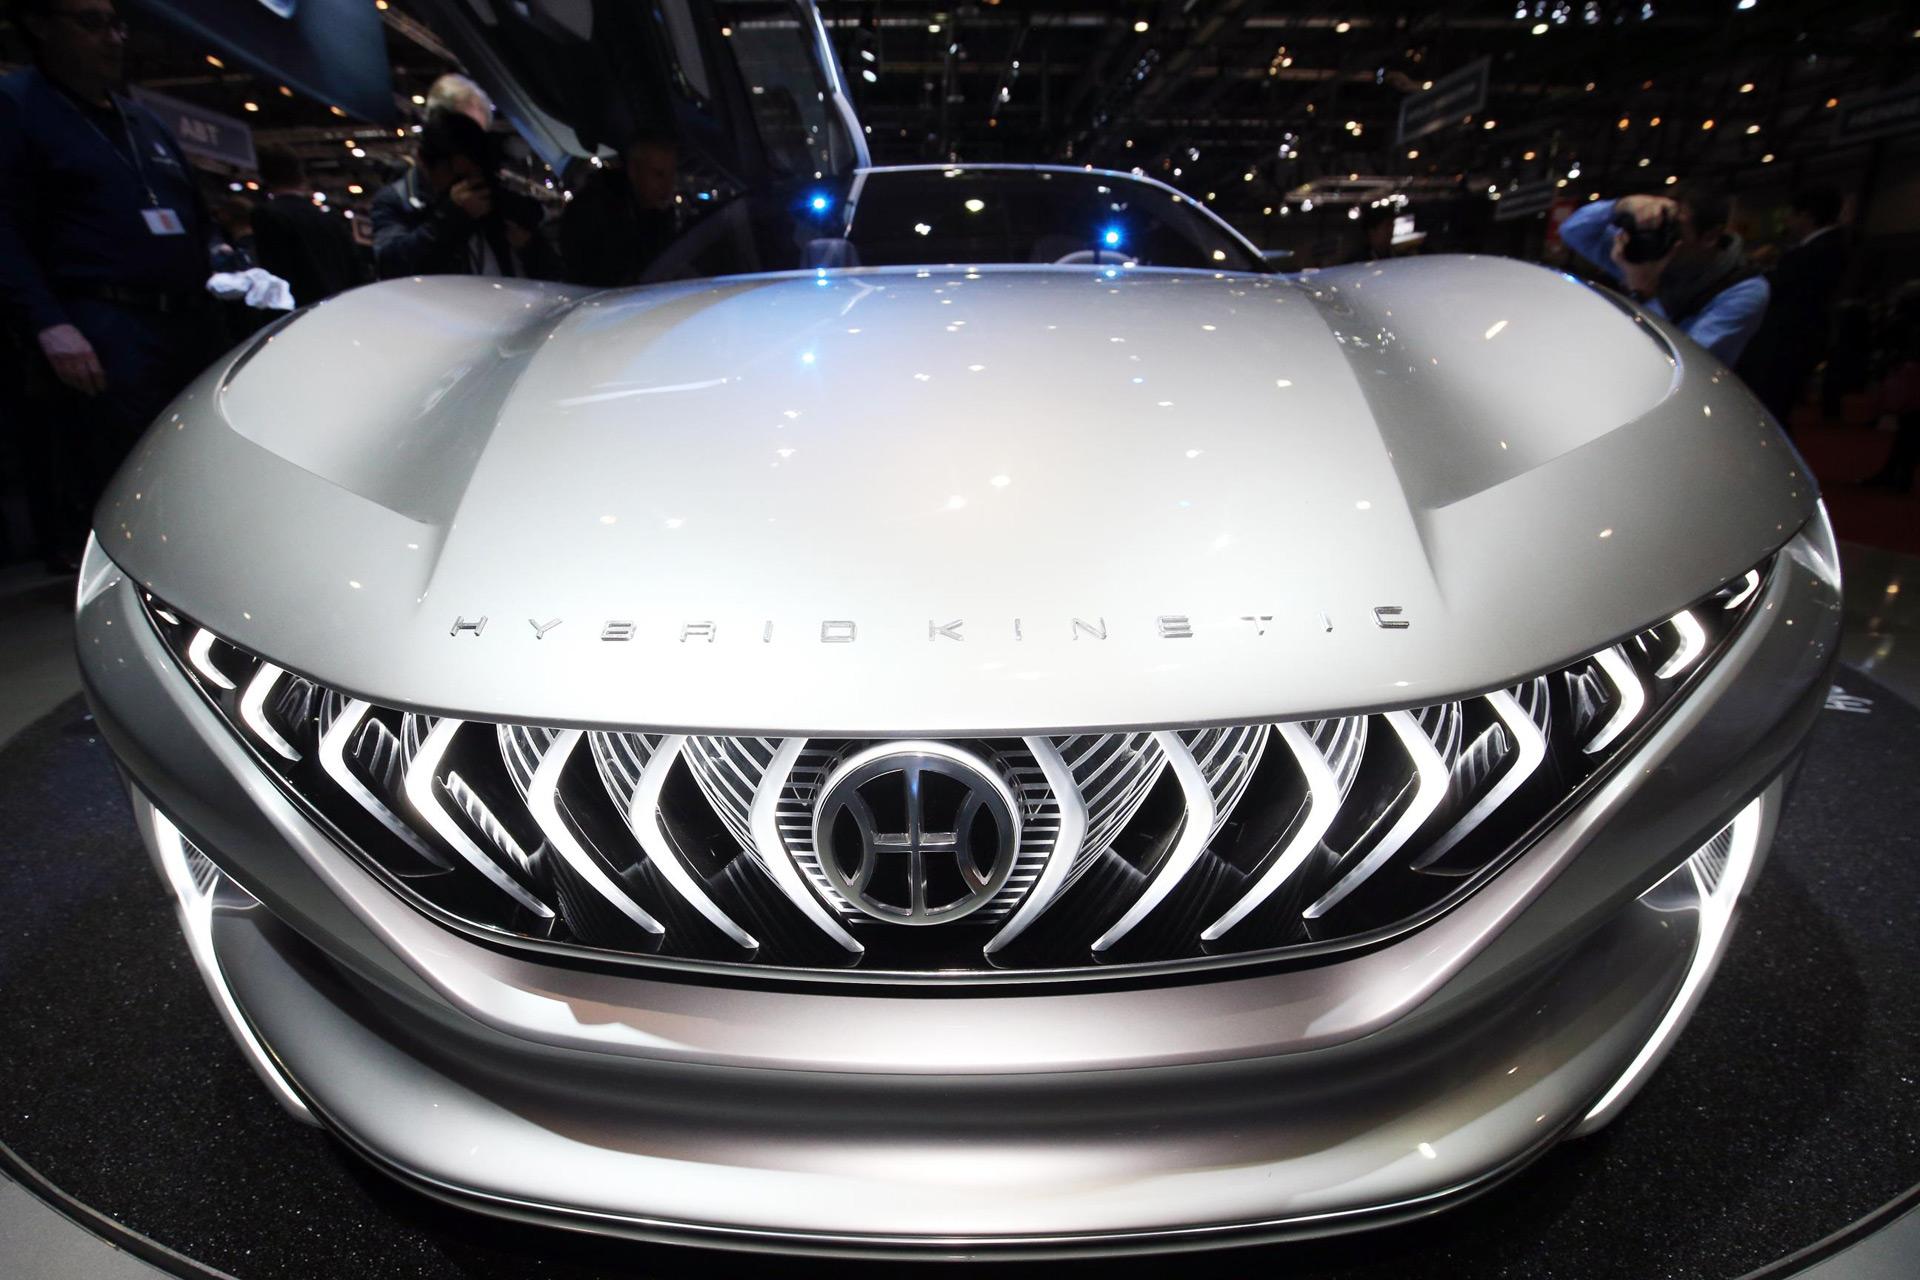 Pininfarina-styled HK GT concept debuts at Geneva auto show